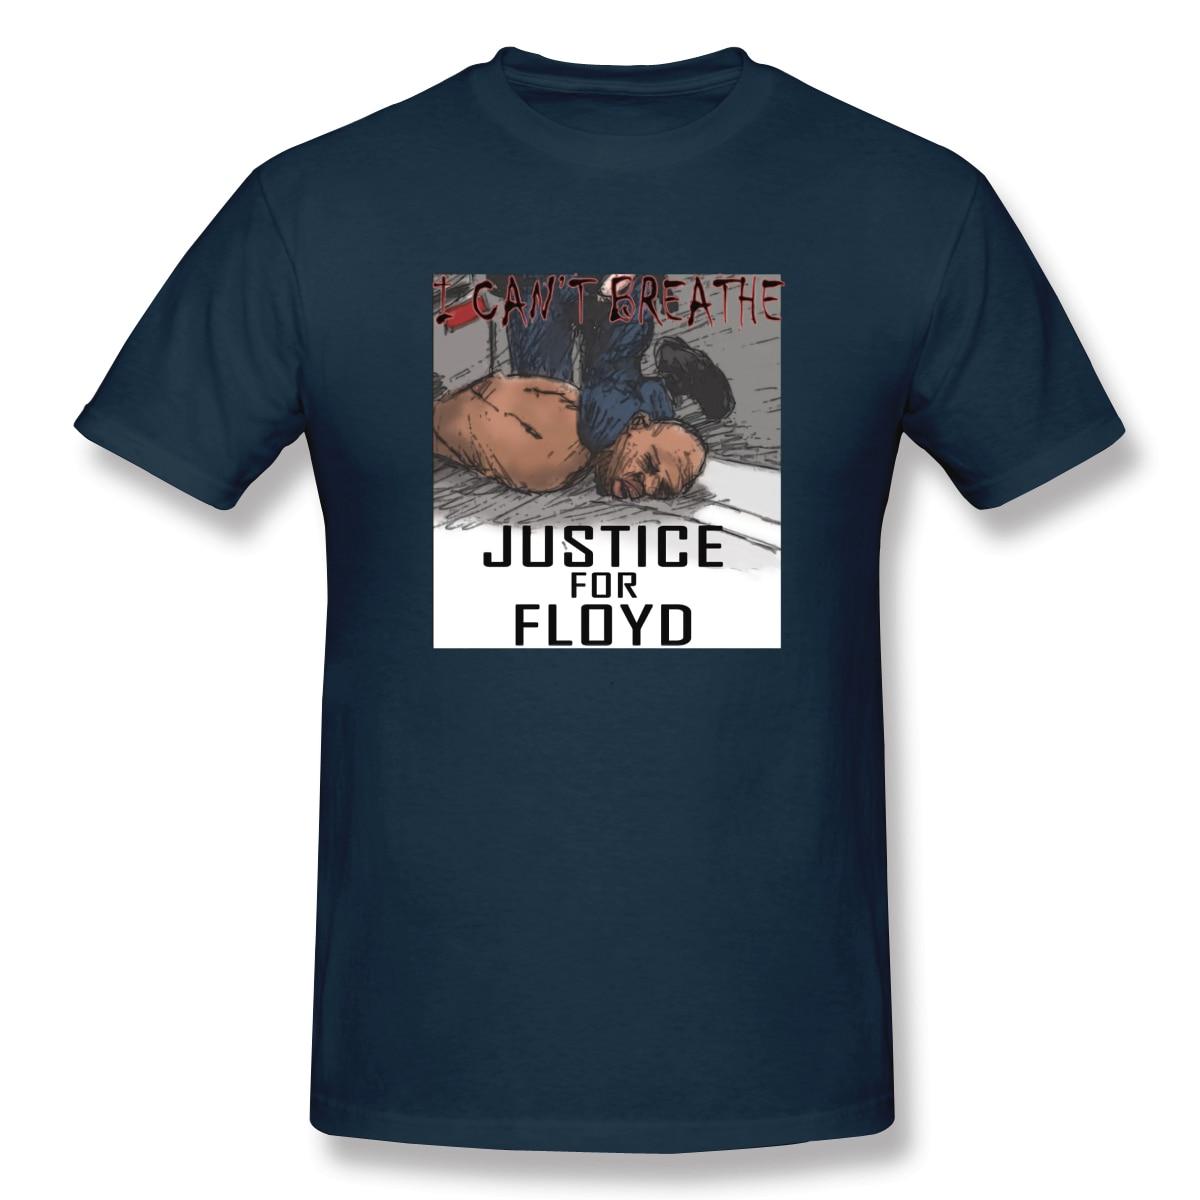 RIP George Floyd Shirt Black Lives Matter Justice Y(1) Men's Basic Short Sleeve T-Shirt European Size